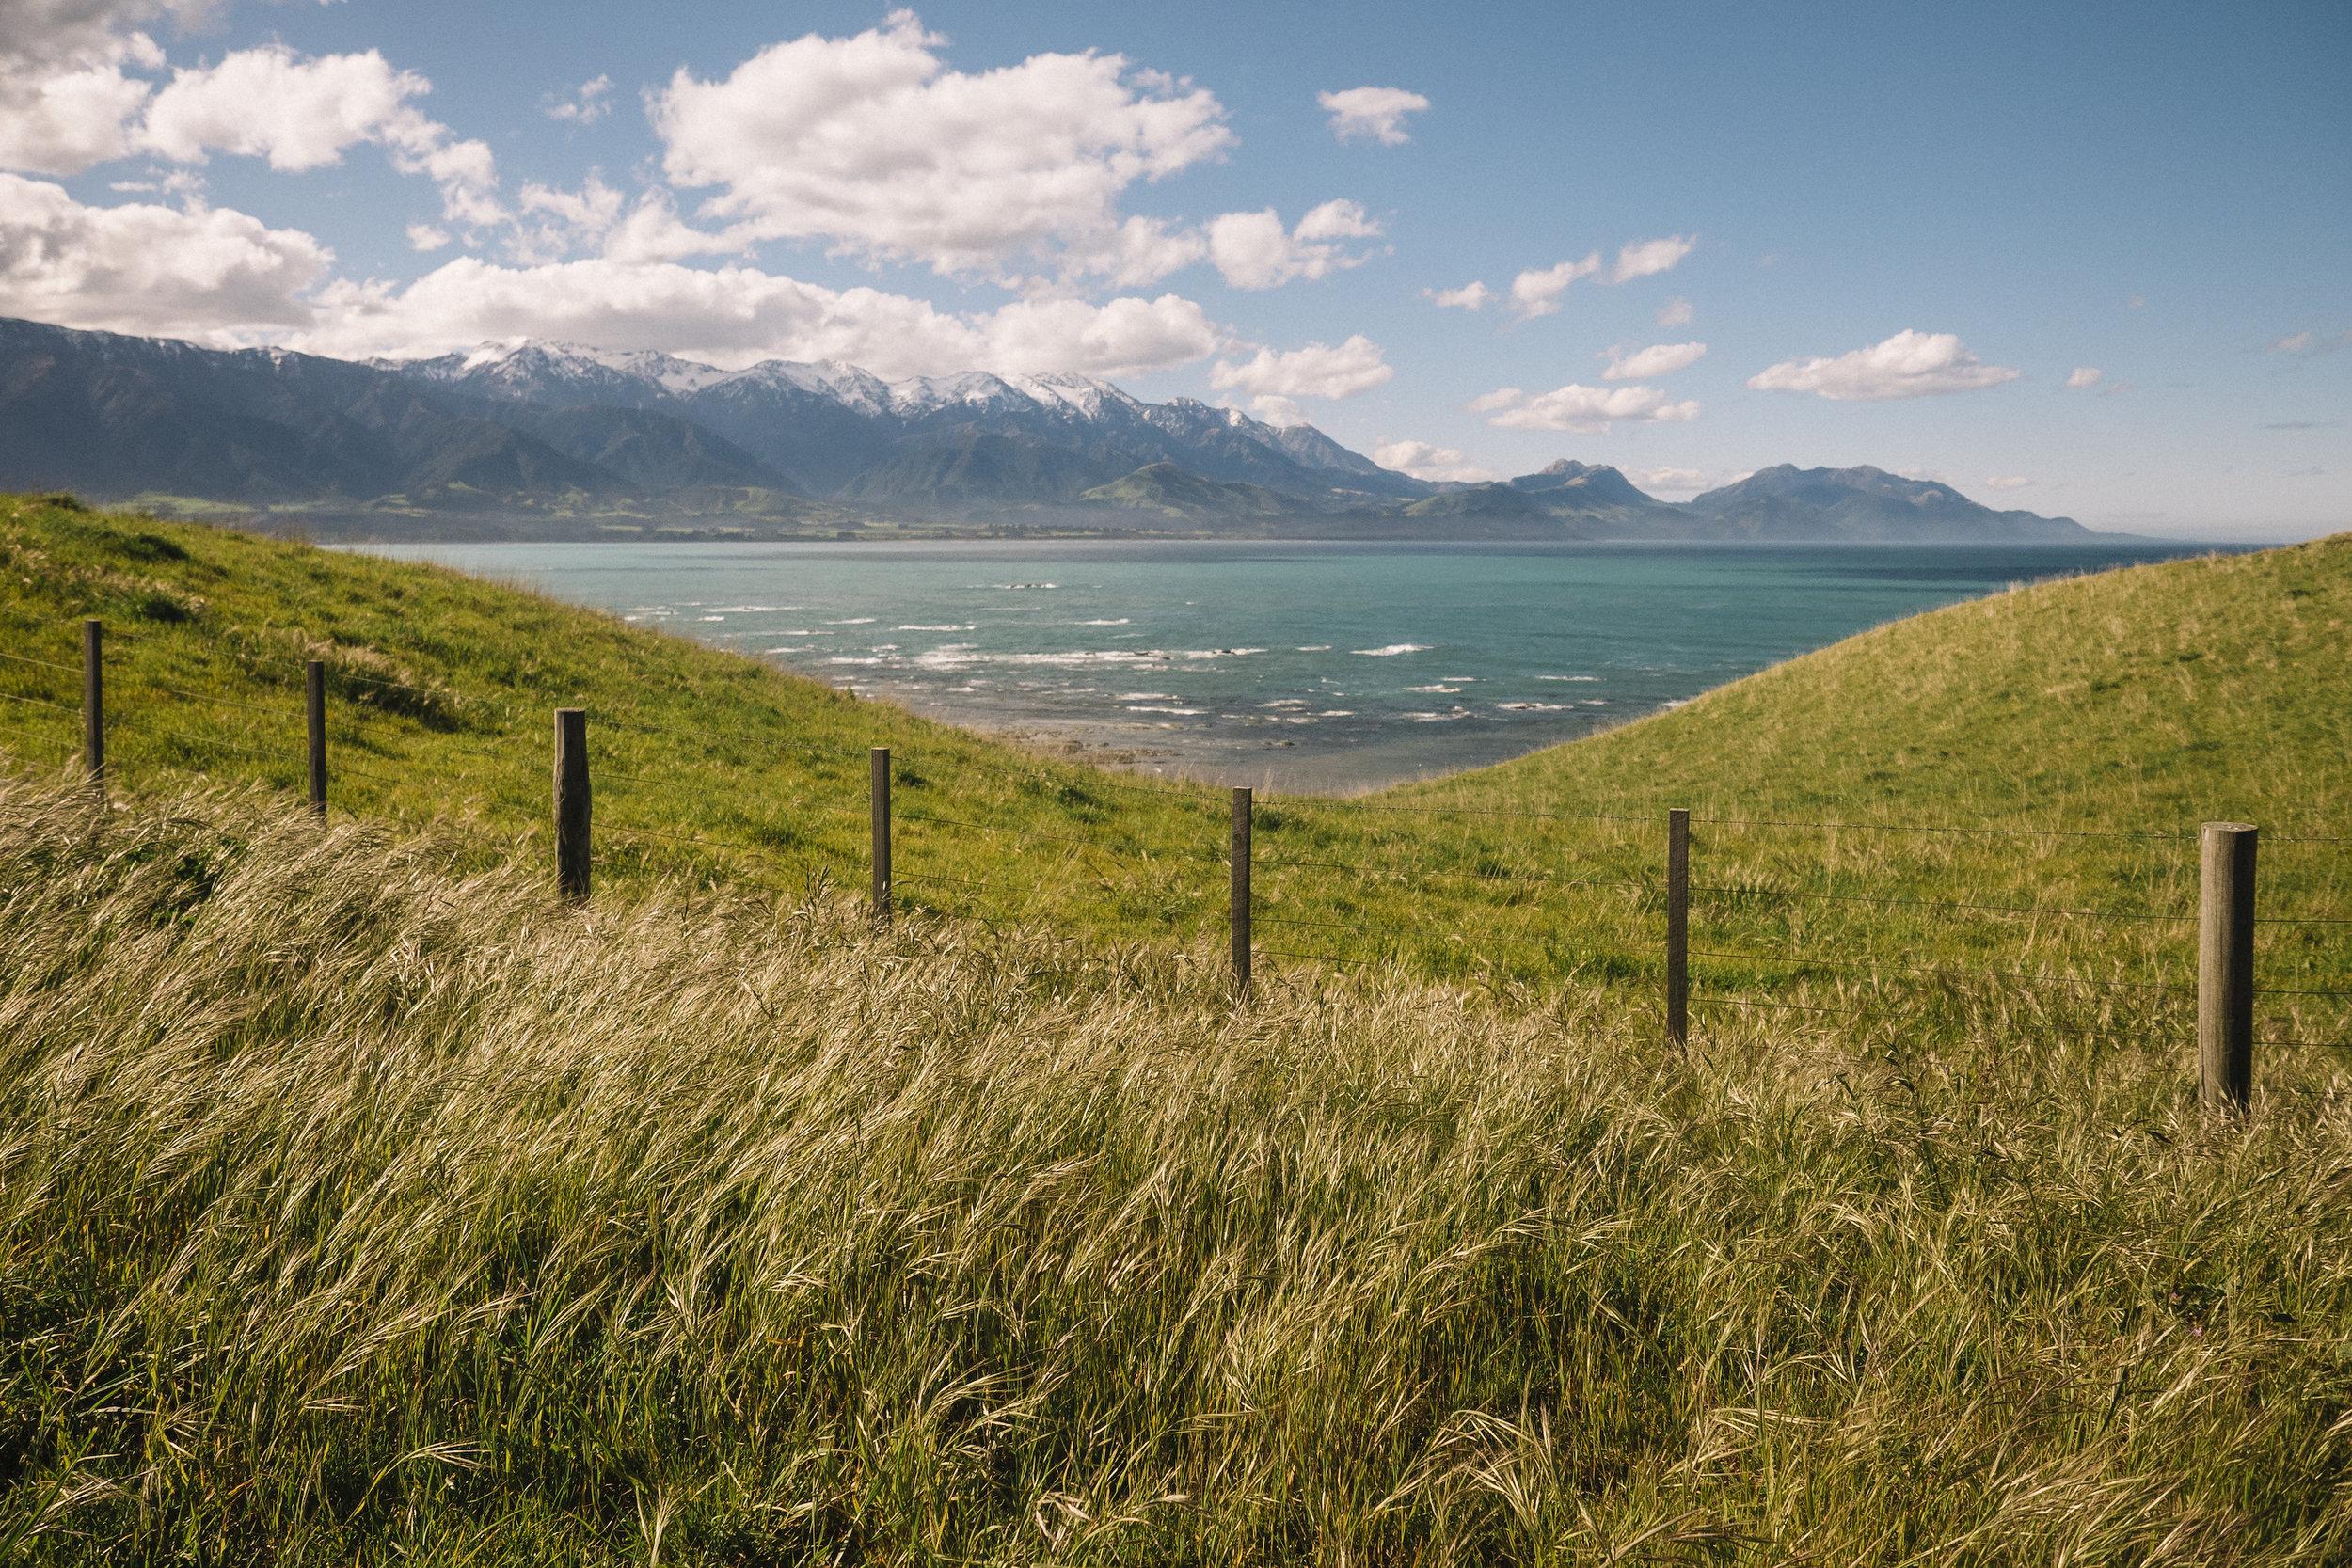 Kaikoura, New Zealand - 2016